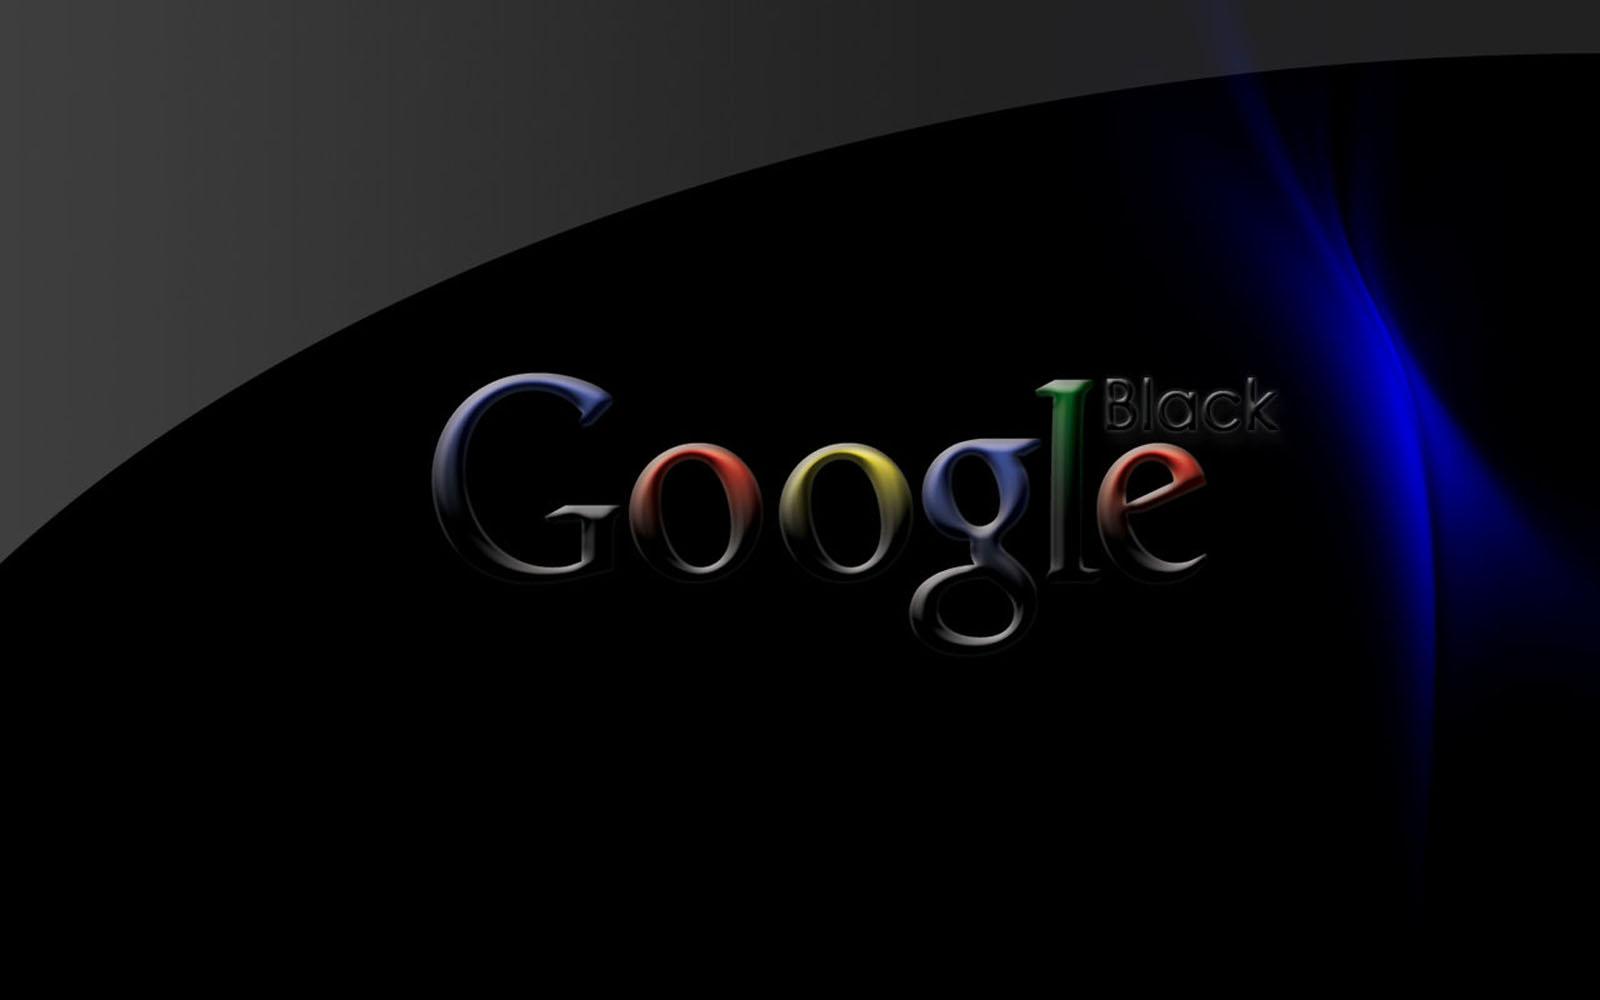 wallpapers Black Google Wallpapers 1600x1000